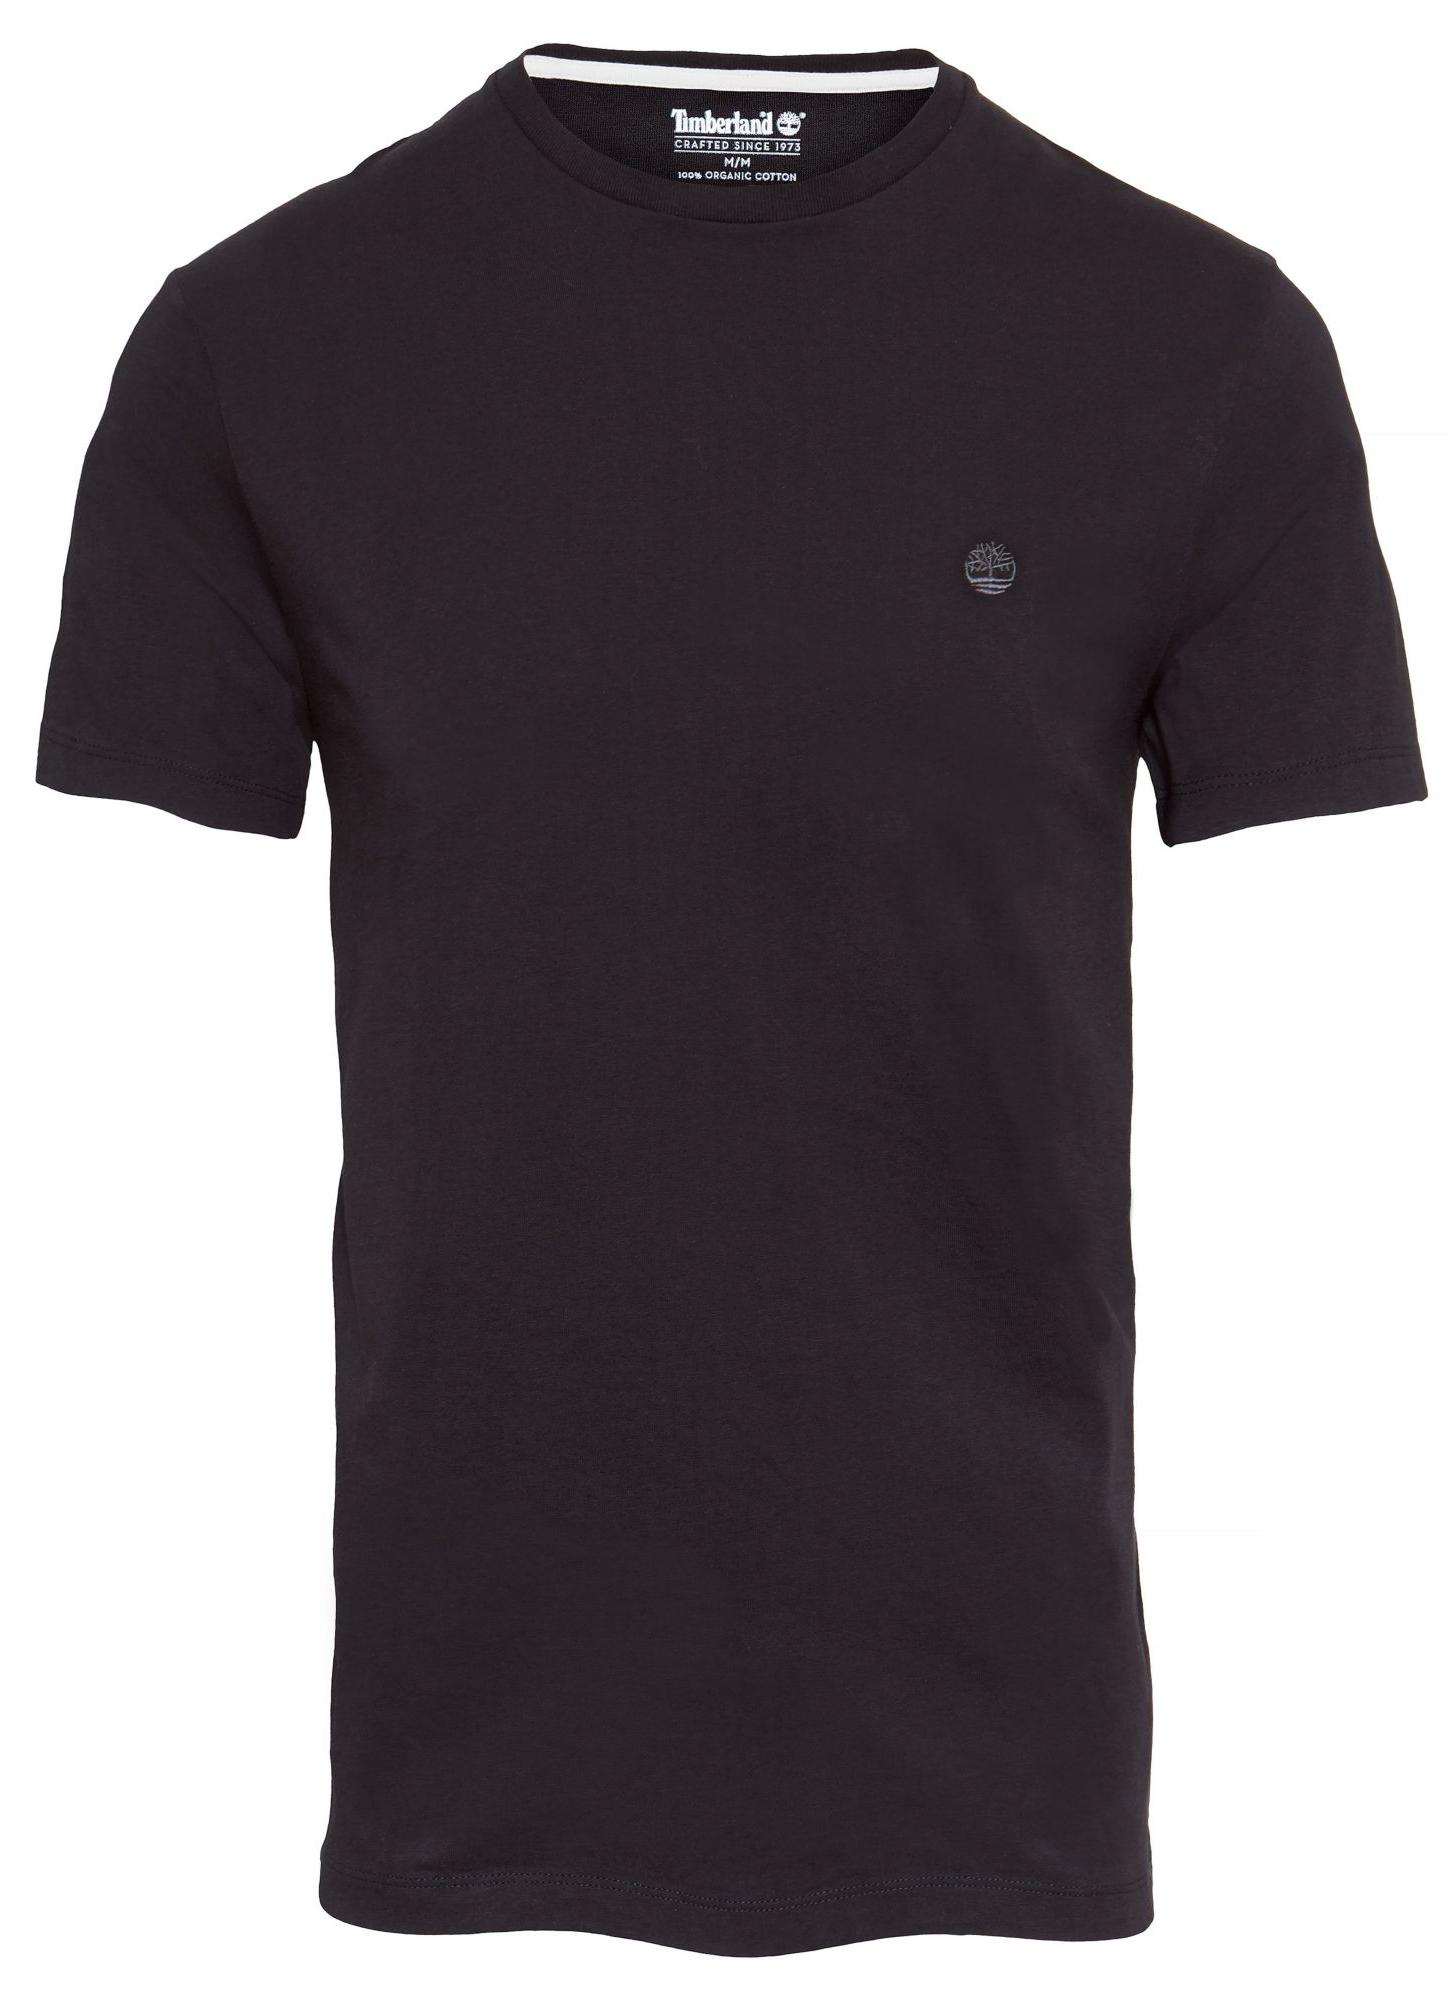 Timberland Retro Brand Tree Logo T-shirt New Mens Crew Neck Print Cotton Tee Top